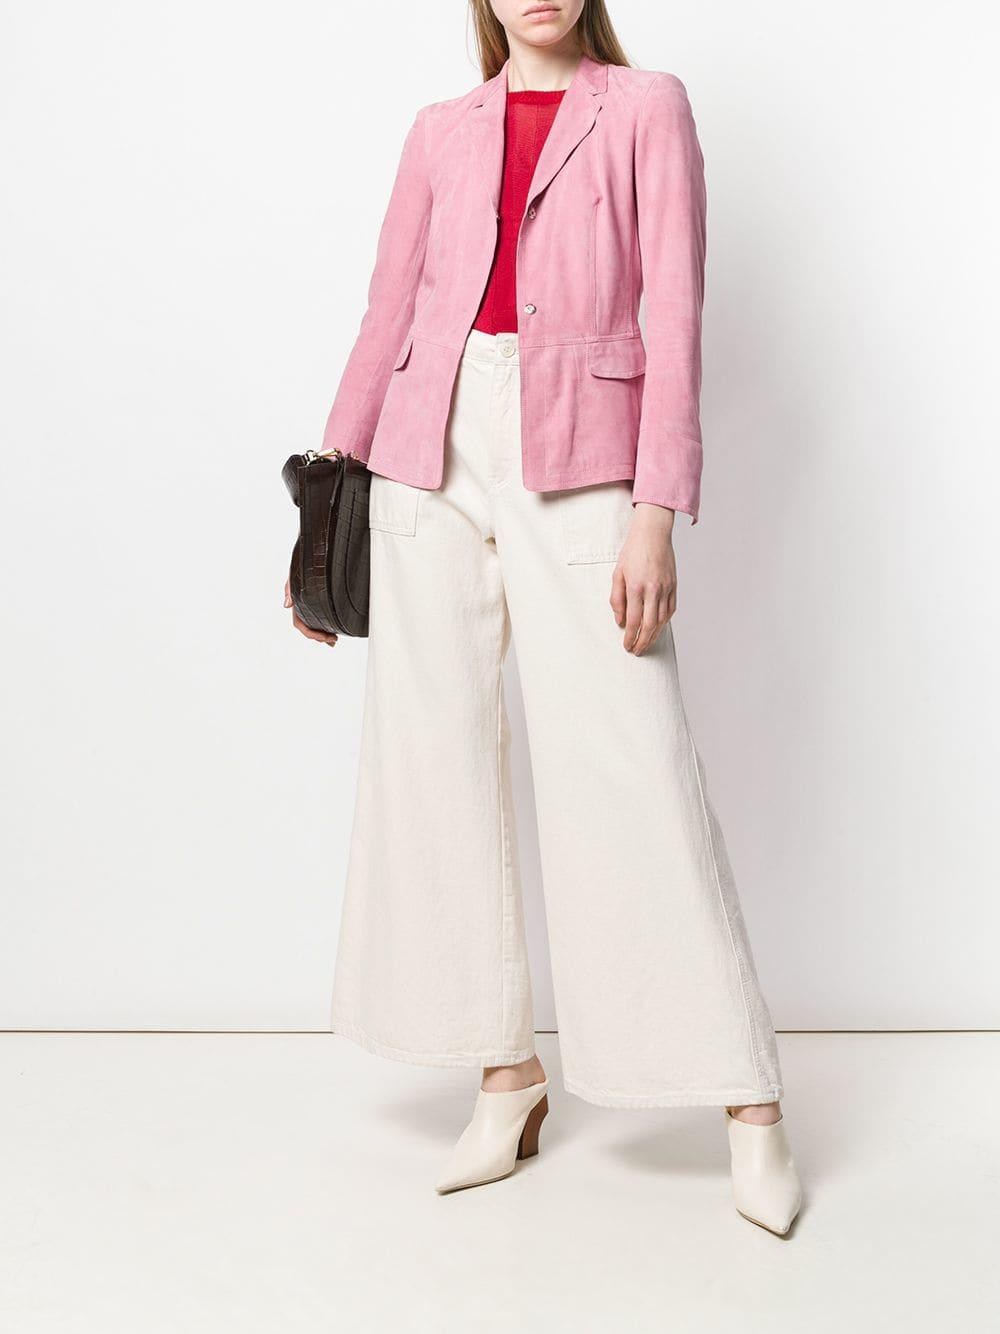 c368478086264 Sylvie Schimmel Fitted Suede Jacket in Pink - Lyst